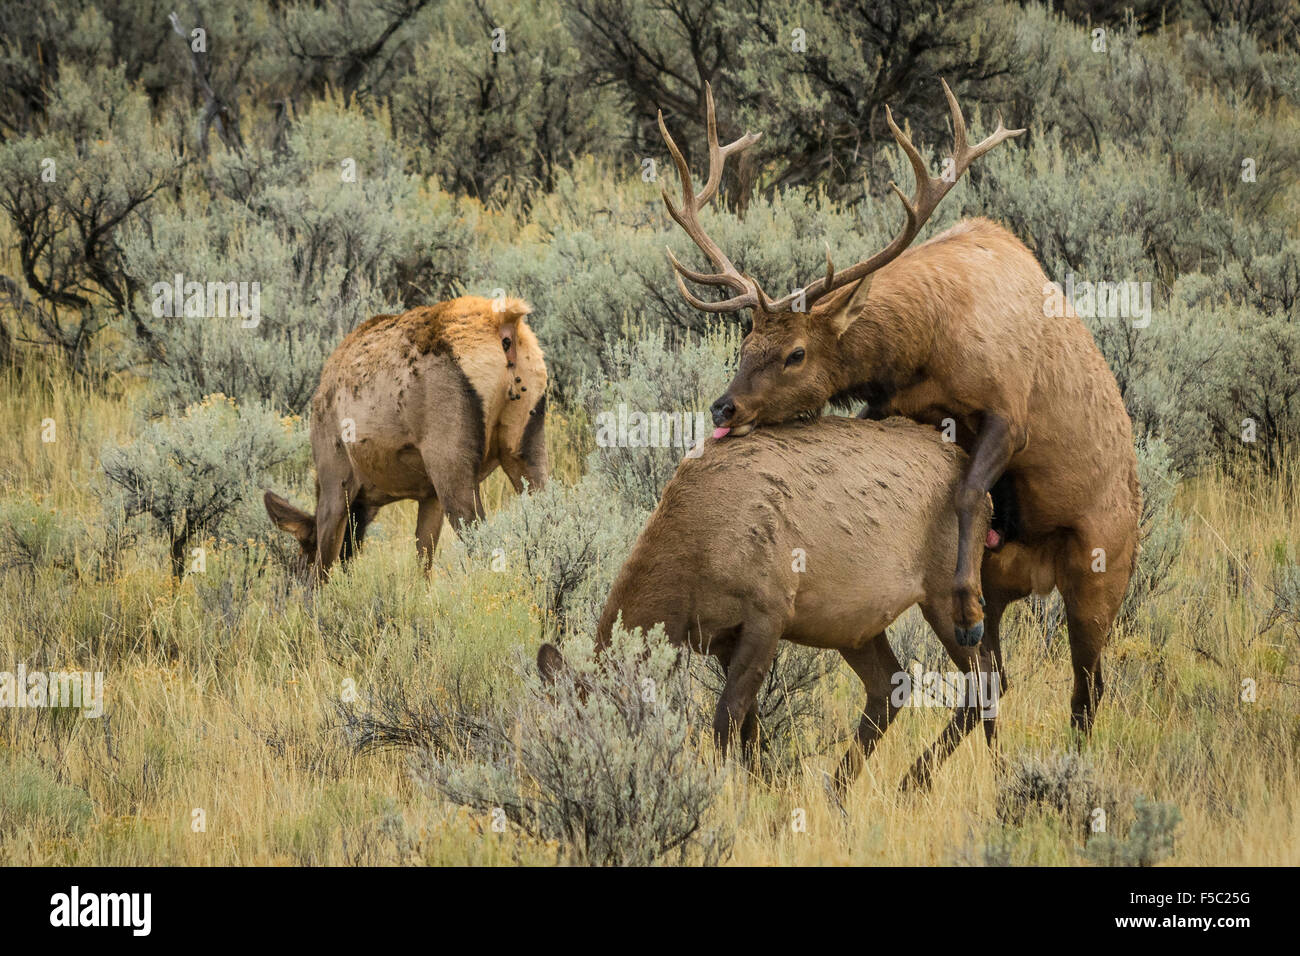 Elk mating; Yellowstone National Park, Wyoming. - Stock Image